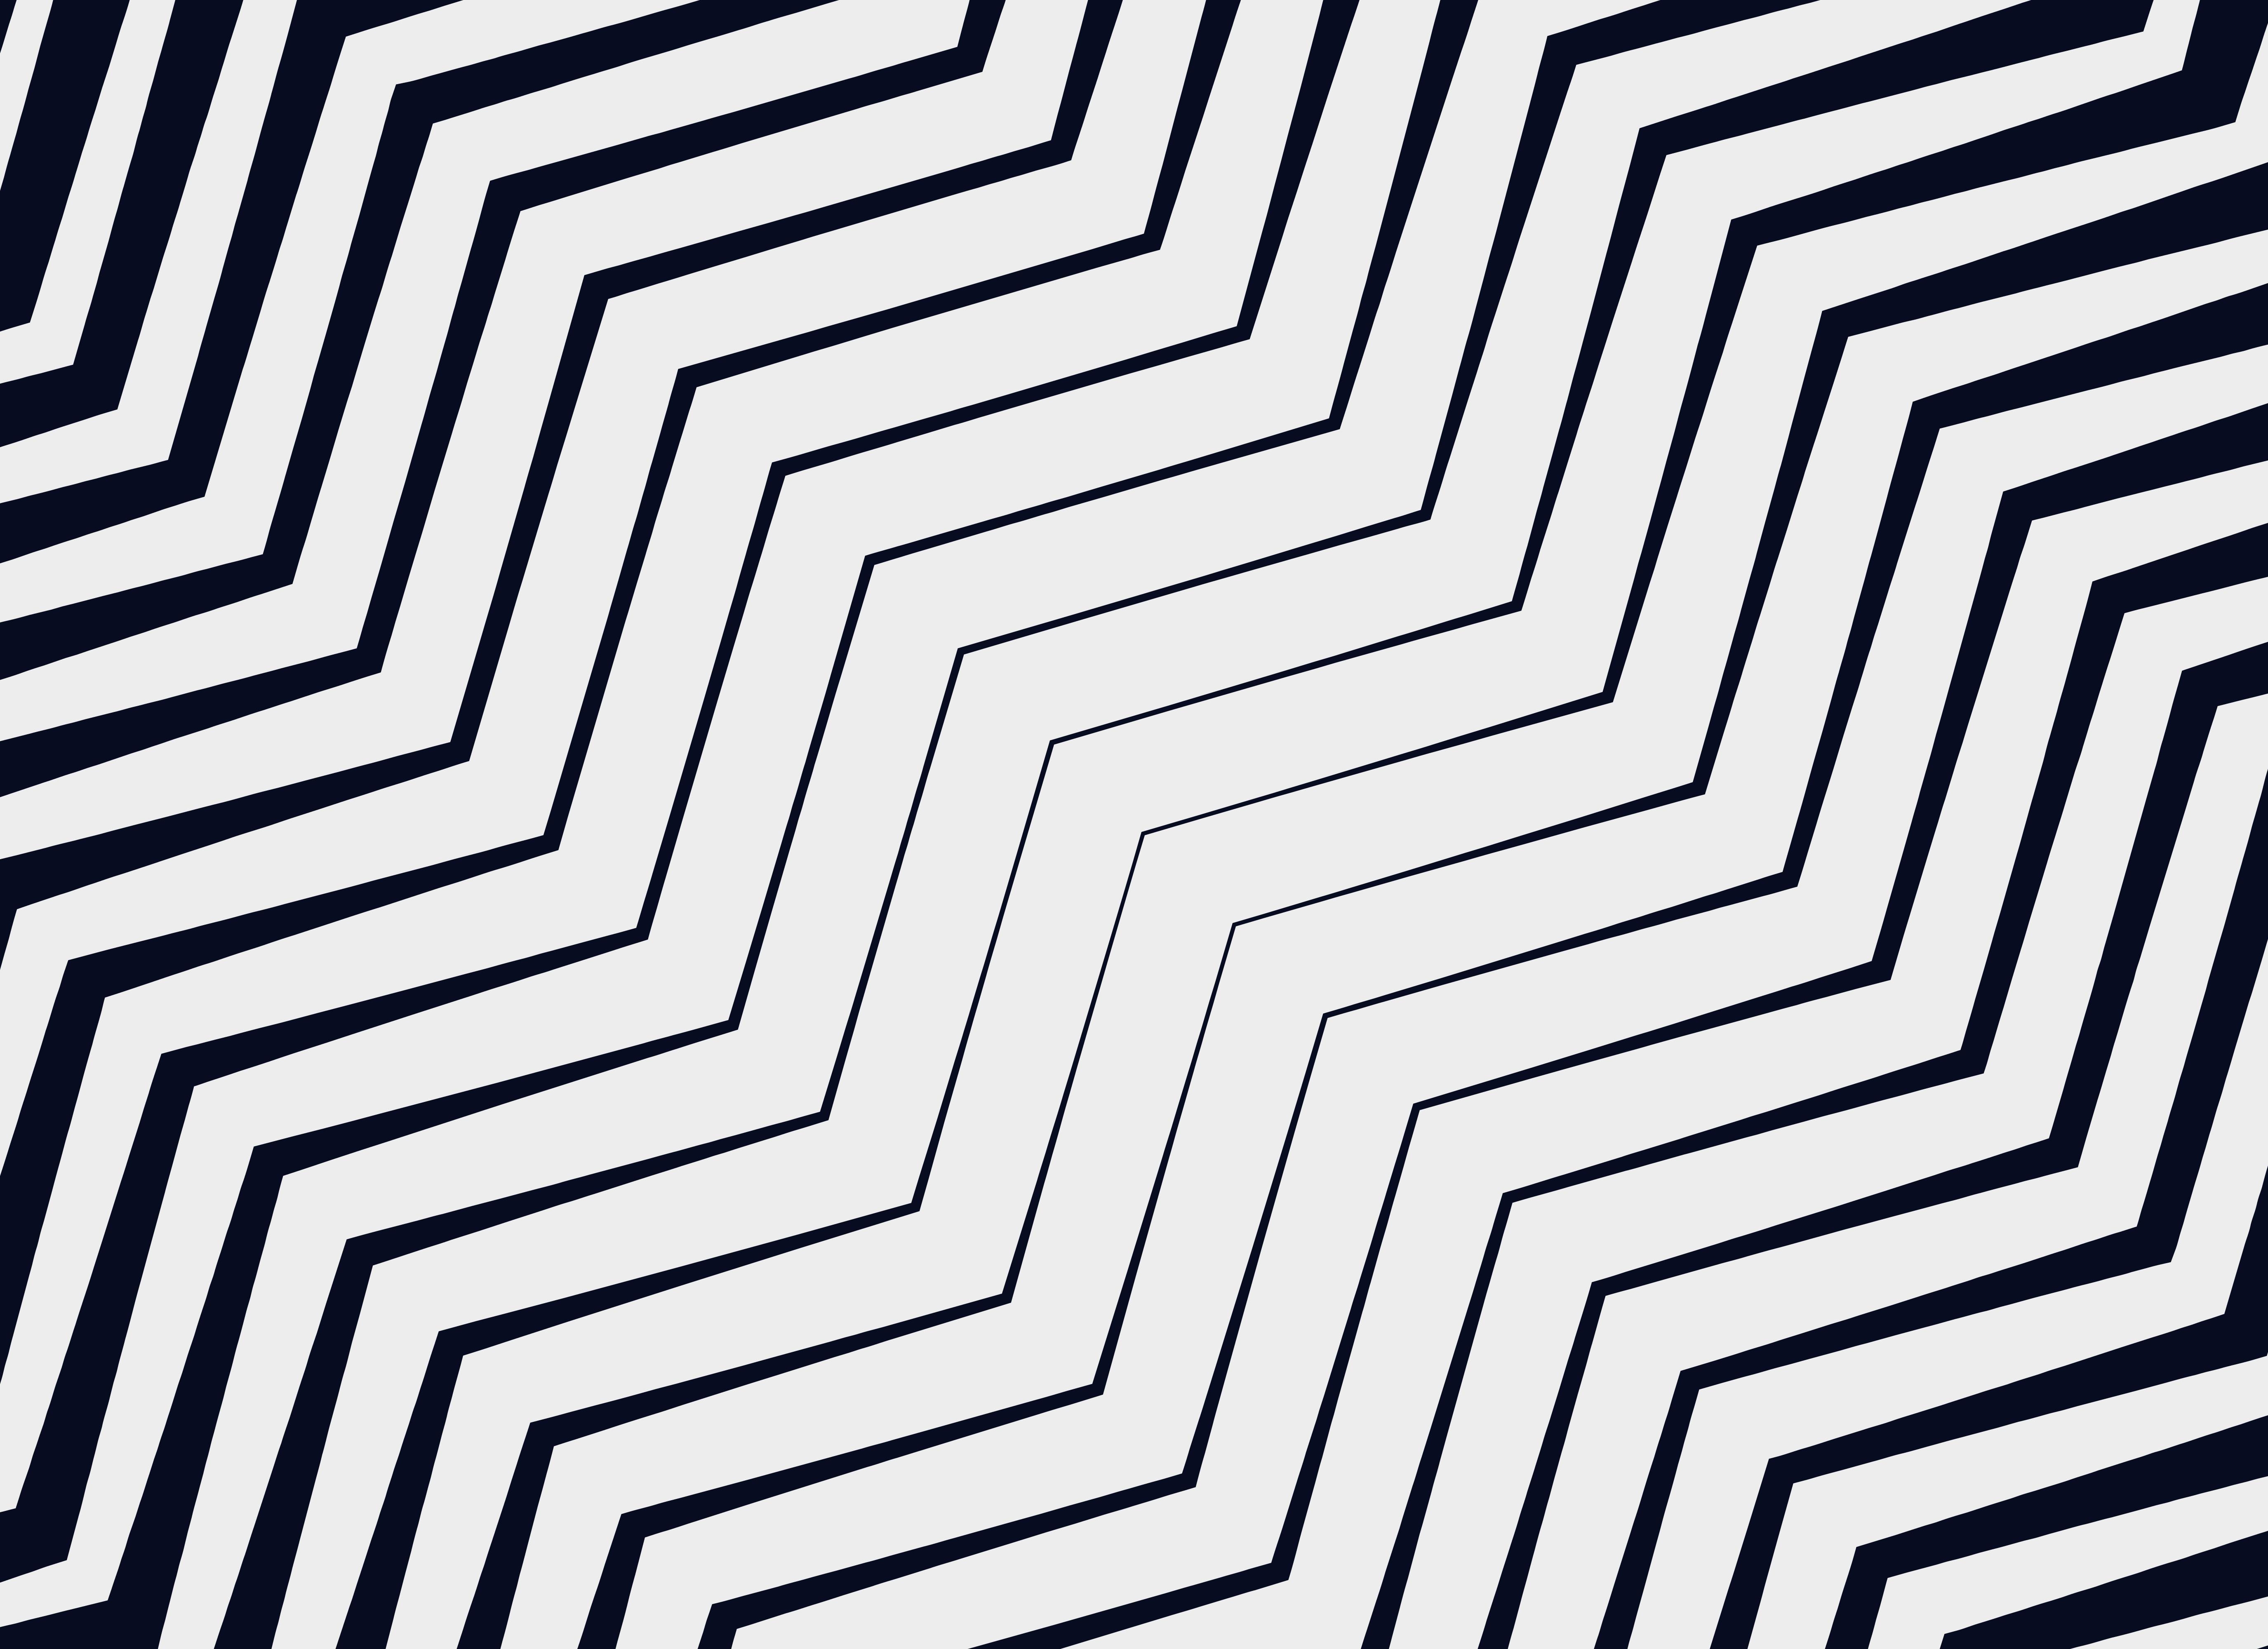 diagonal zigzag vector pattern background download free vector art stock graphics images. Black Bedroom Furniture Sets. Home Design Ideas